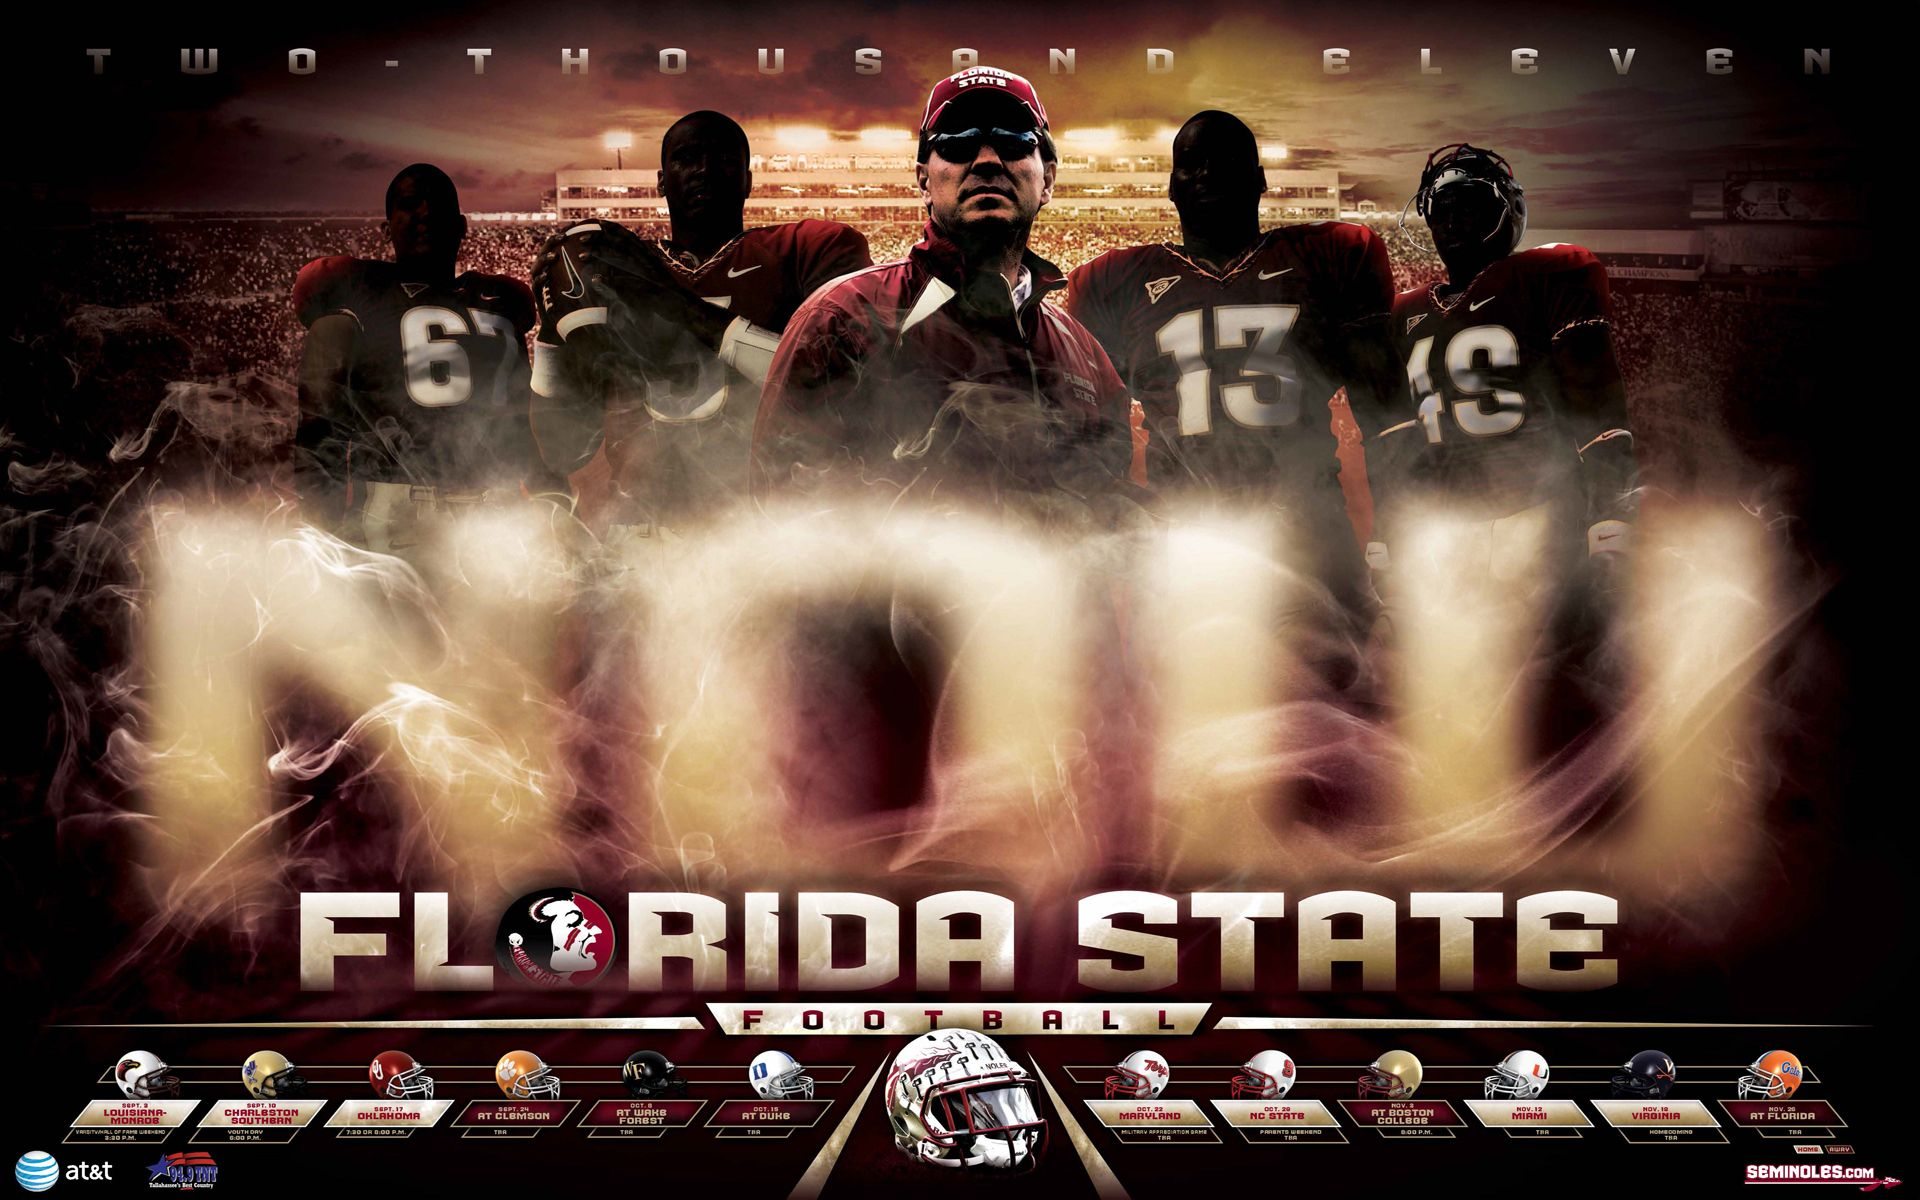 Puro Florida State 1 Florida State Football Florida State Florida State Seminoles